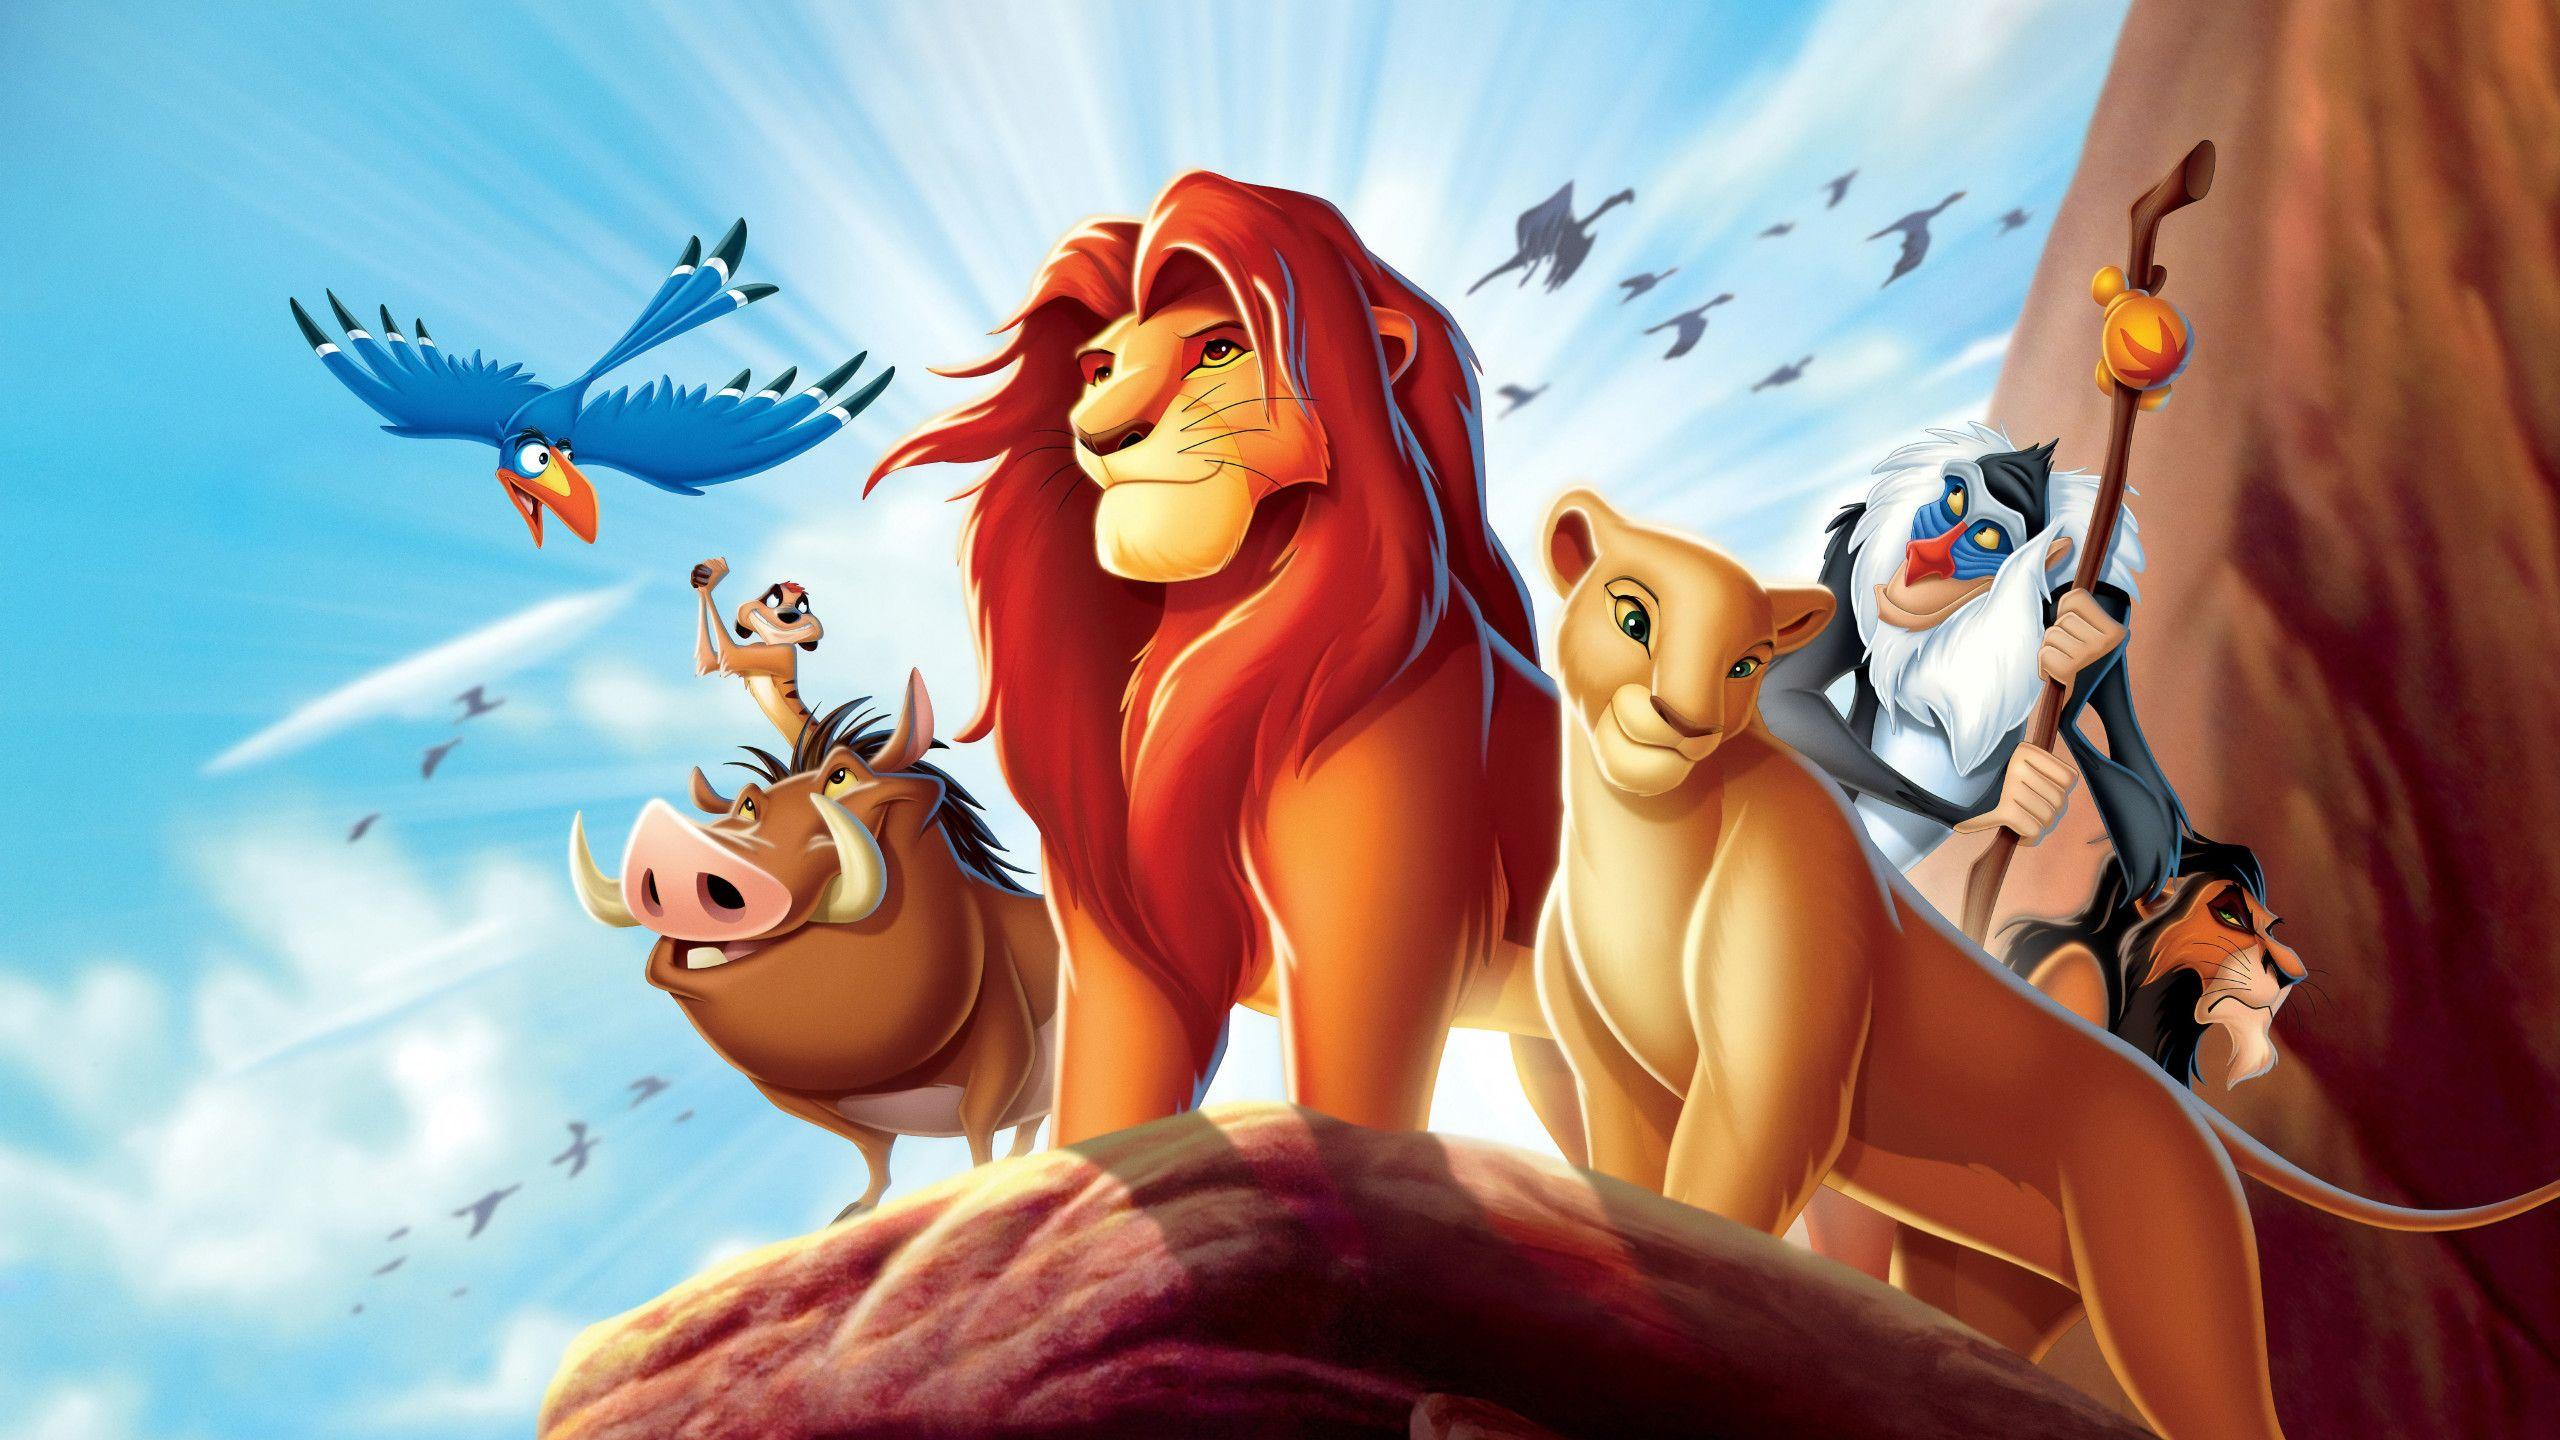 Movies censored by Disney+